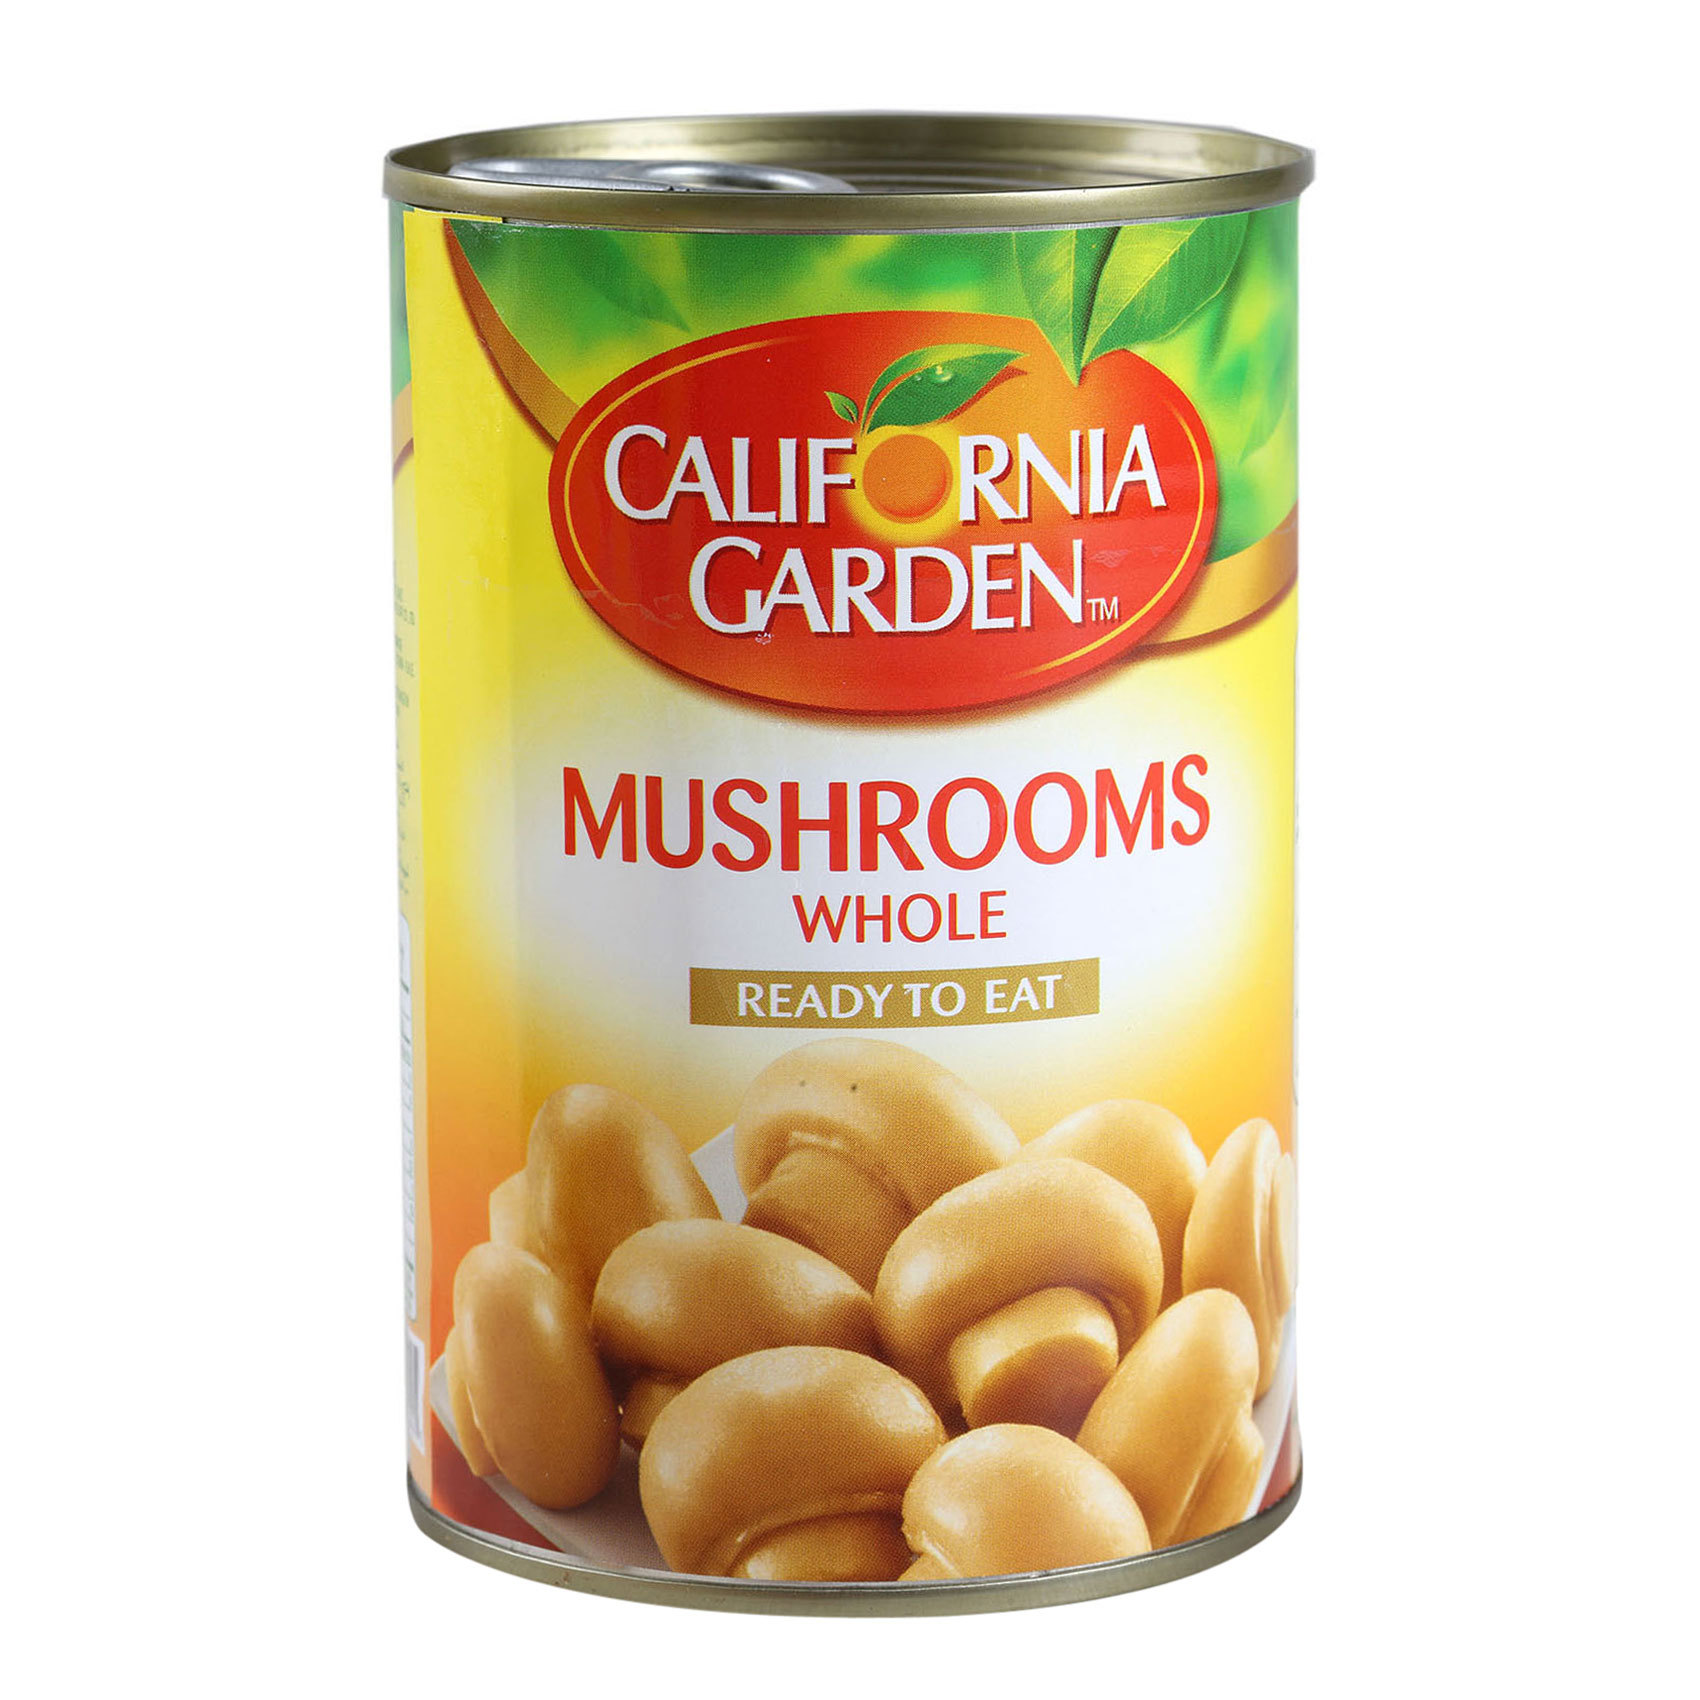 CALIFORNIA GWHOLE MUSHROOMS 425GR